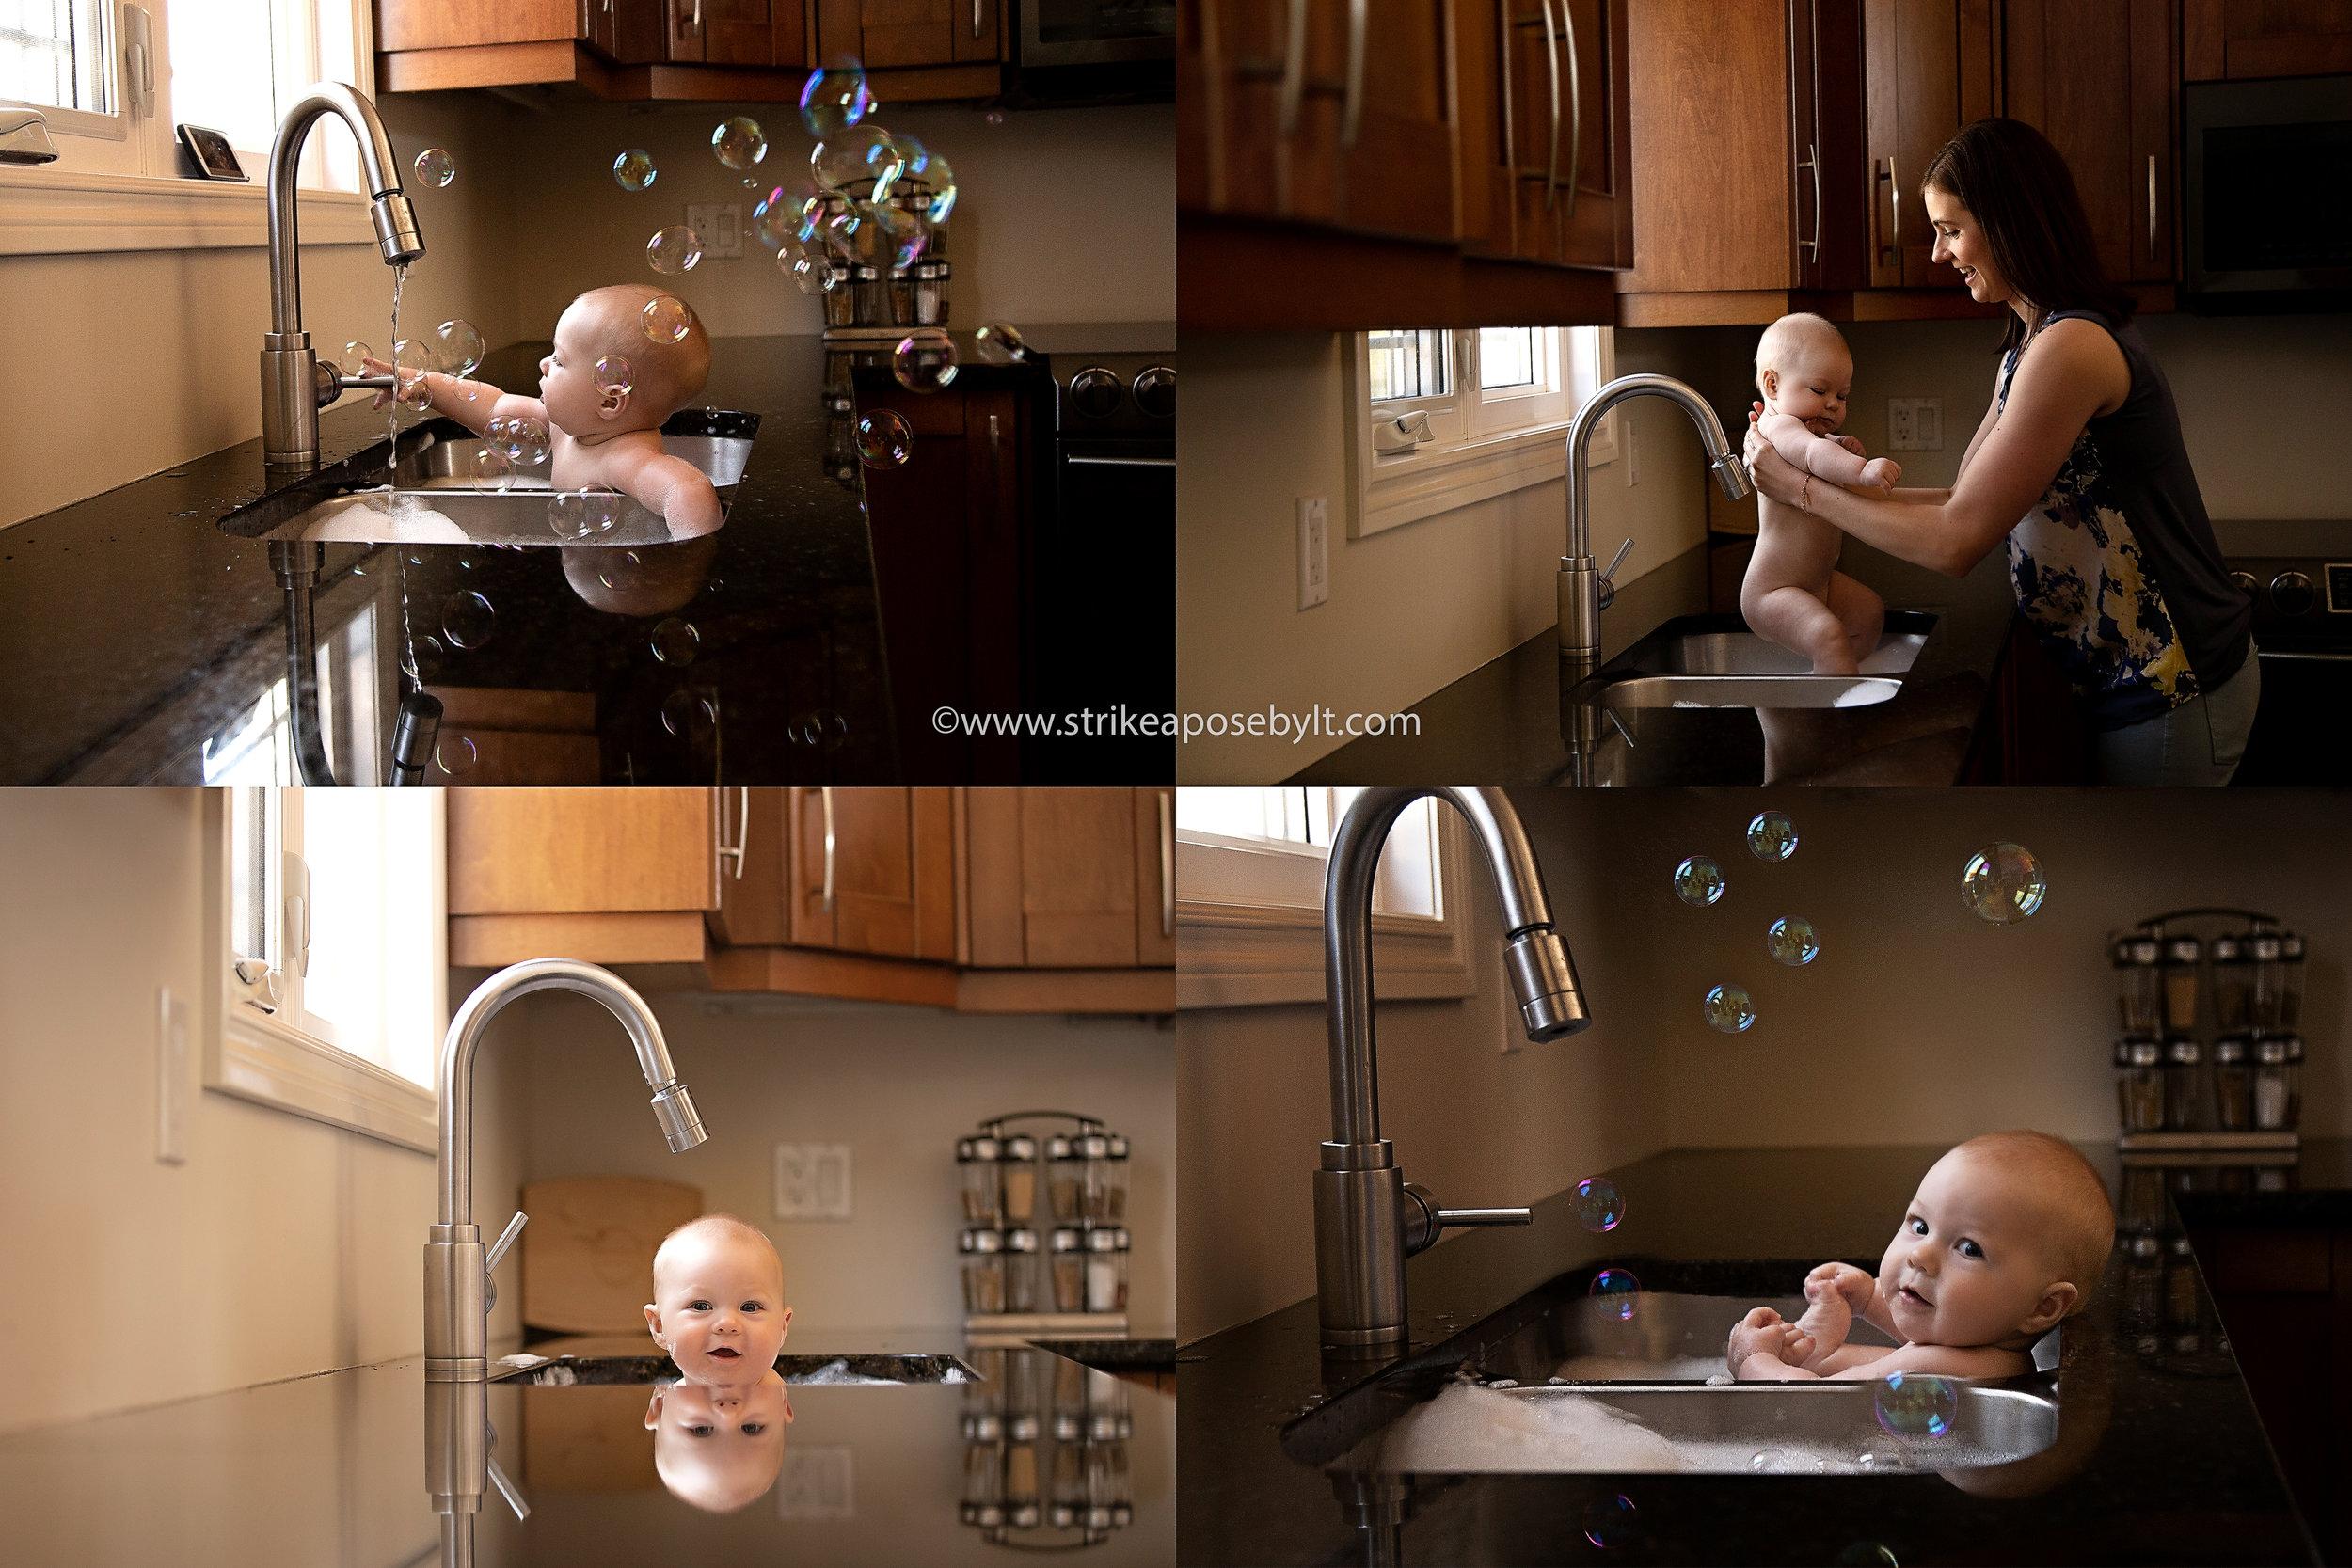 Collage Sink Bath Session.jpg